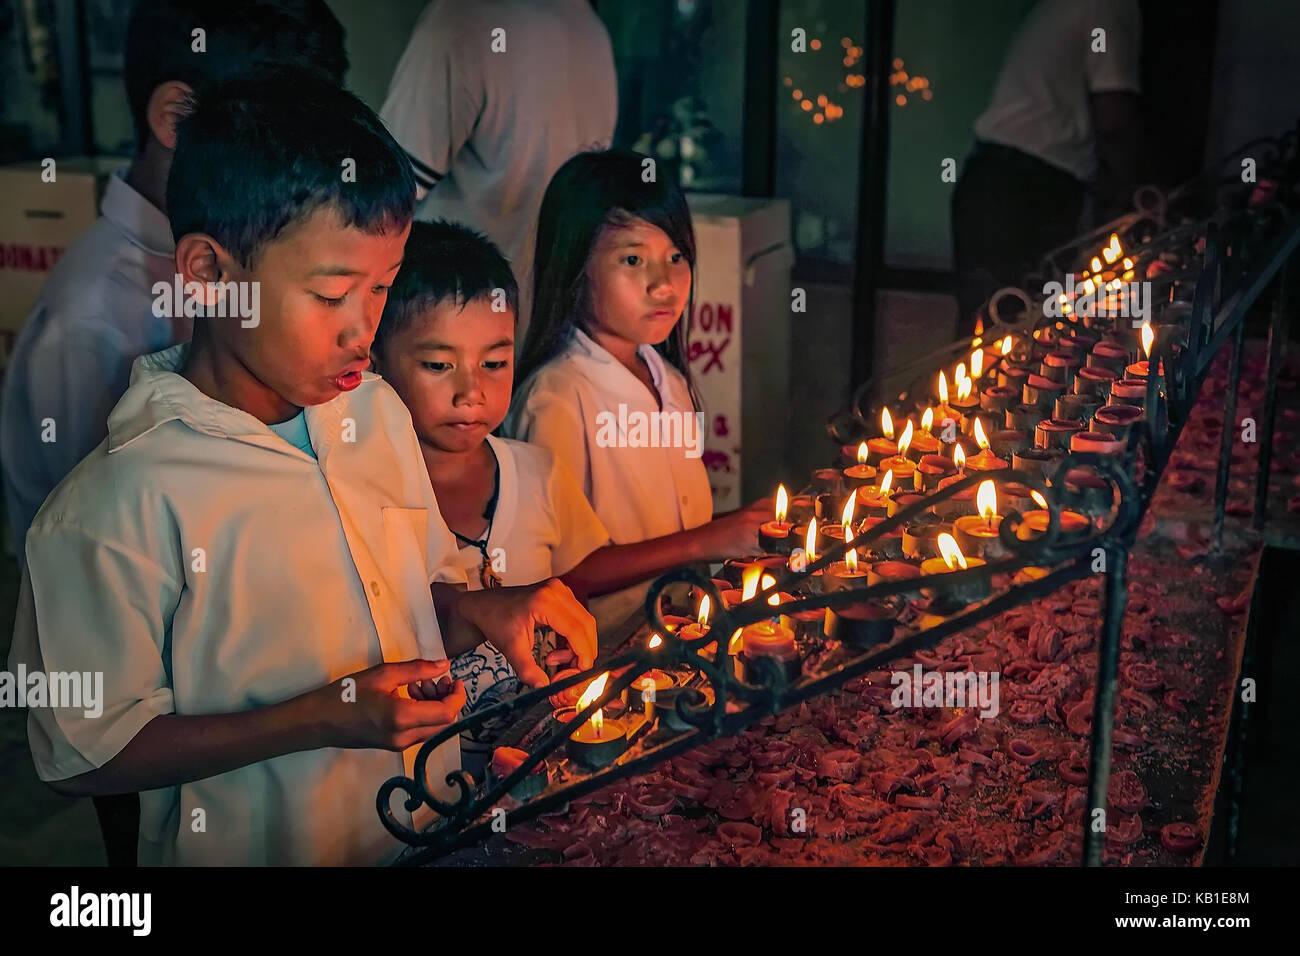 Filipino Catholic children light votive candles in the Santo Nino Parish Church in Tacloban City  sc 1 st  Alamy & Catholic Church Candle Lighting Stock Photos u0026 Catholic Church ...